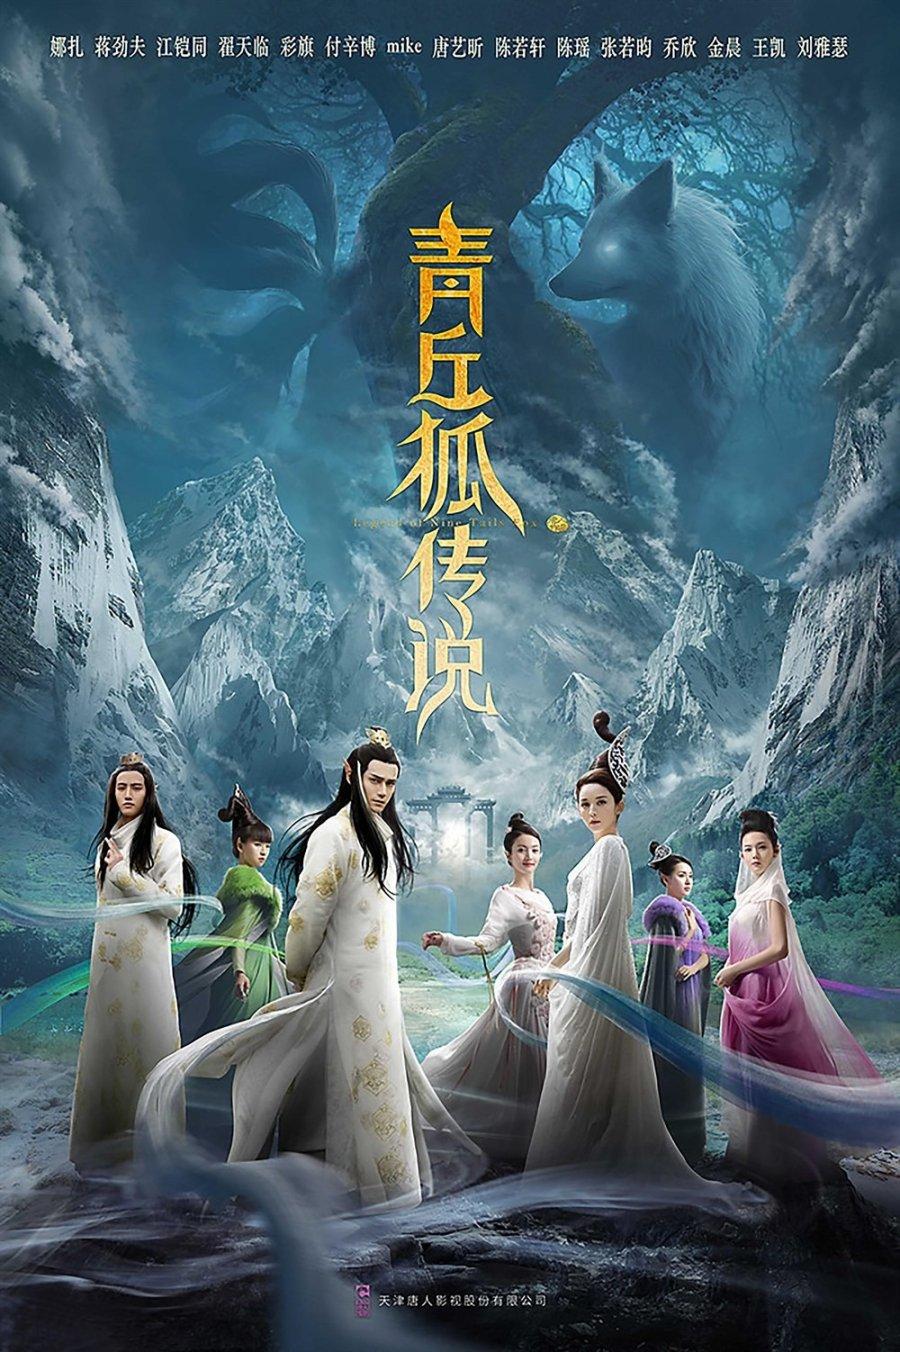 Legend of Nine Tails Fox (2016) / 青丘狐传说